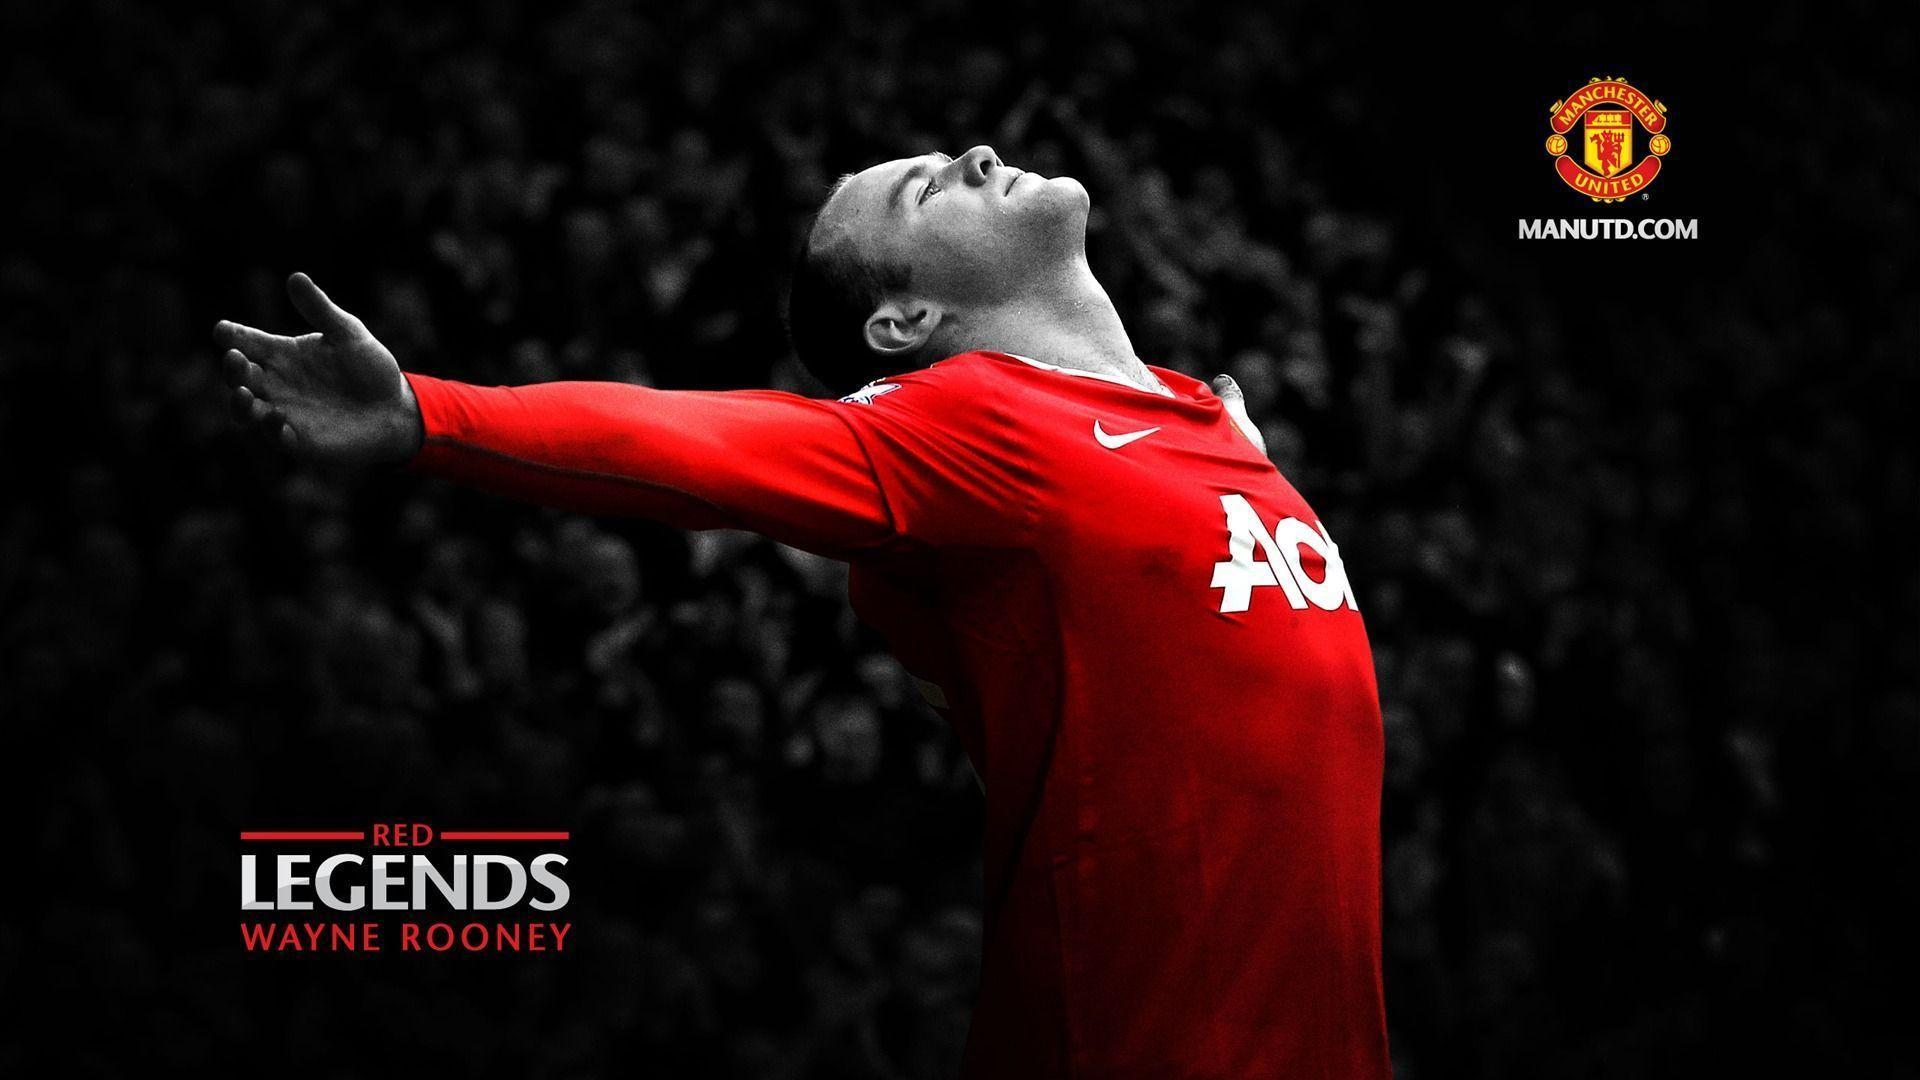 Manchester United Wallpaper High Resolution #13268 Wallpaper | AWS ...